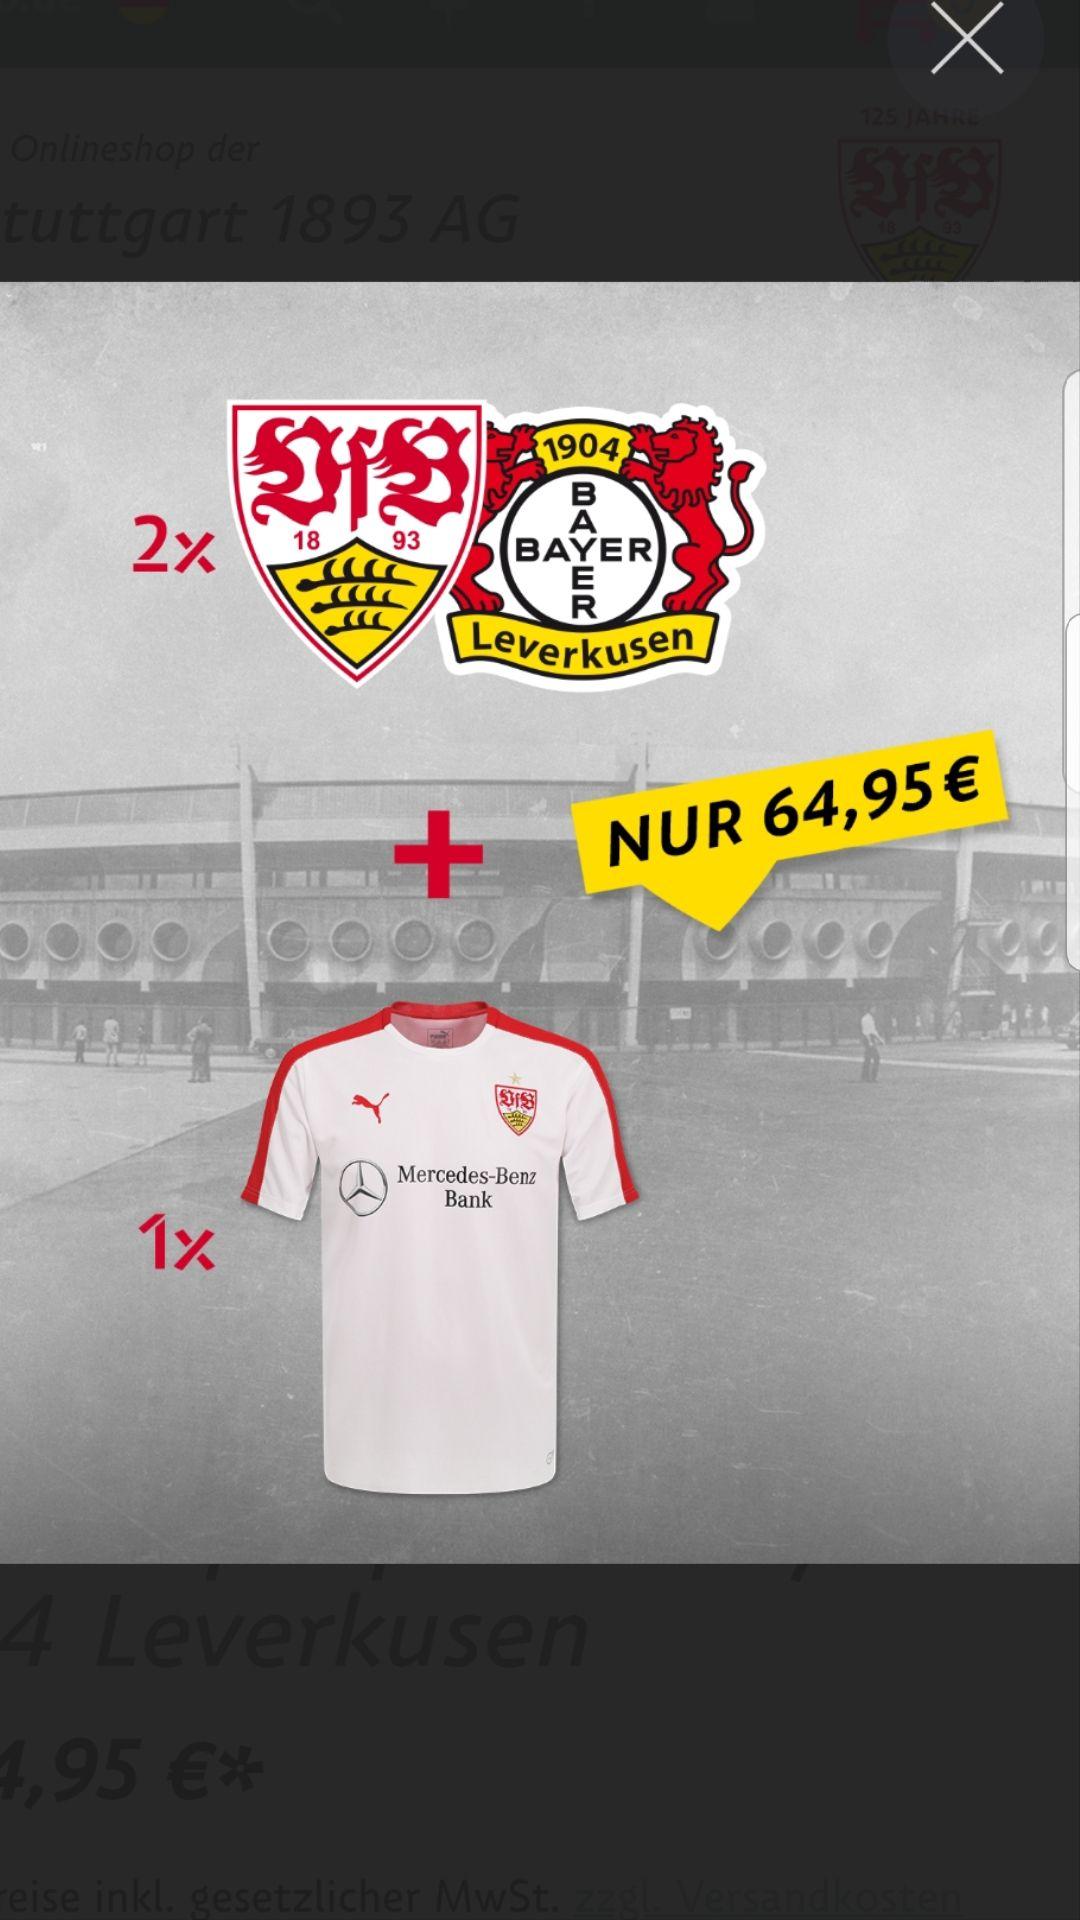 VfB Stuttgart Heimspielpaket Bayer Leverkusen (12.4-15.4) 2×Haupttribüne+Stadion Shirt